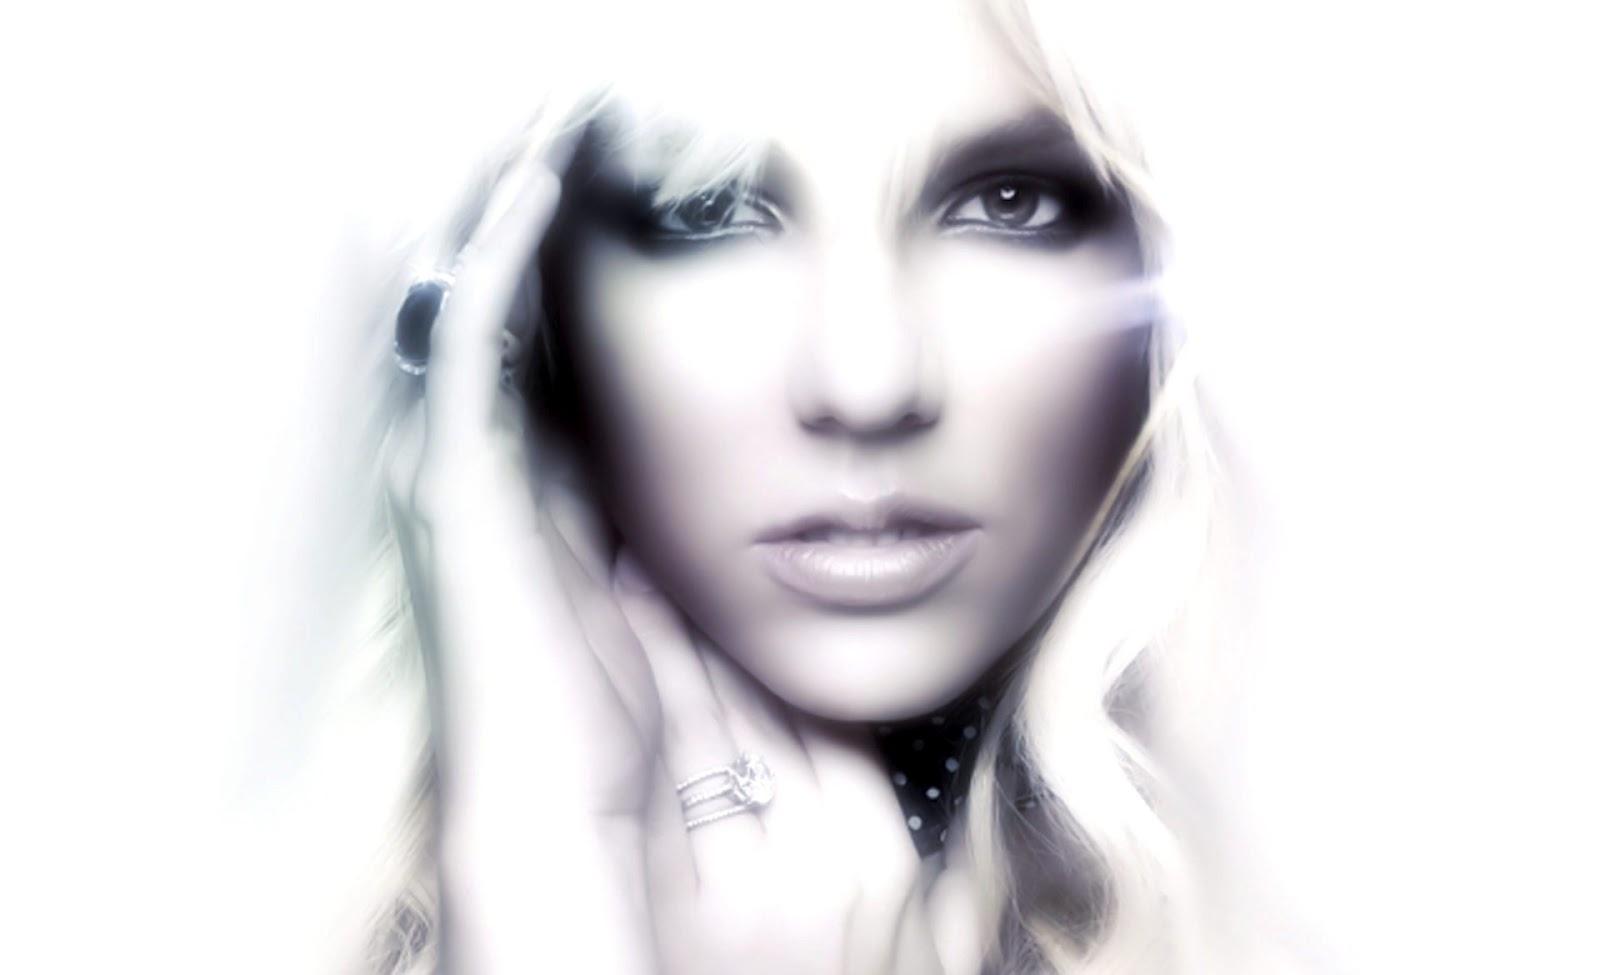 http://2.bp.blogspot.com/-bj5VrP662Yo/T3Zt1xKlfKI/AAAAAAAAFFU/5loywZf9i2A/s1600/Britney+Spears+(21).jpg